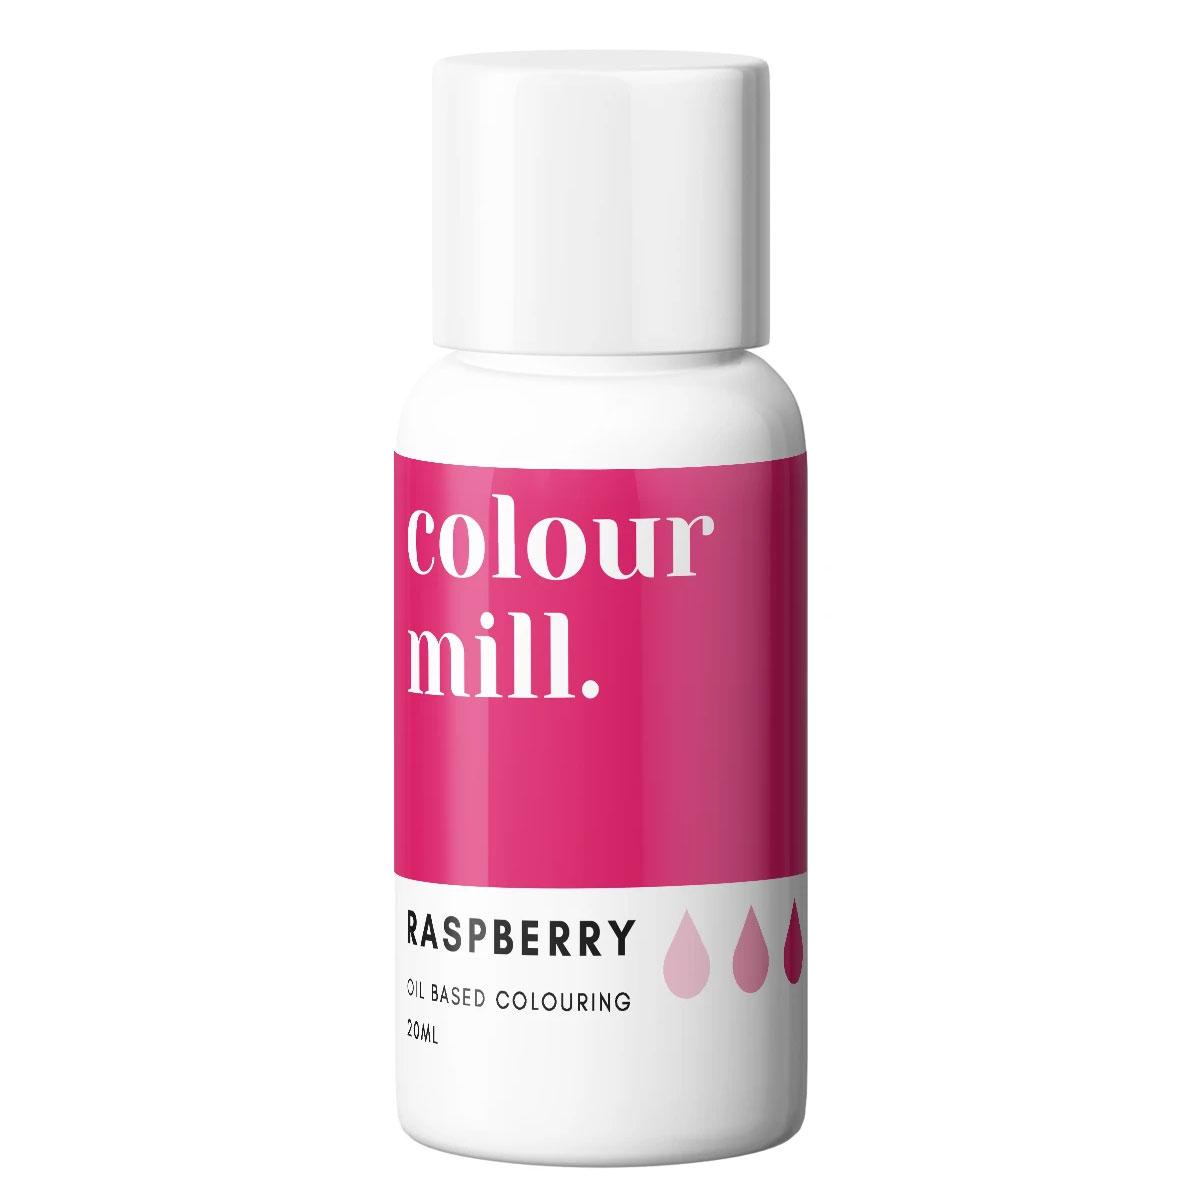 Colour Mill fettlösliche Lebensmittelfarbe - Raspberry 20ml